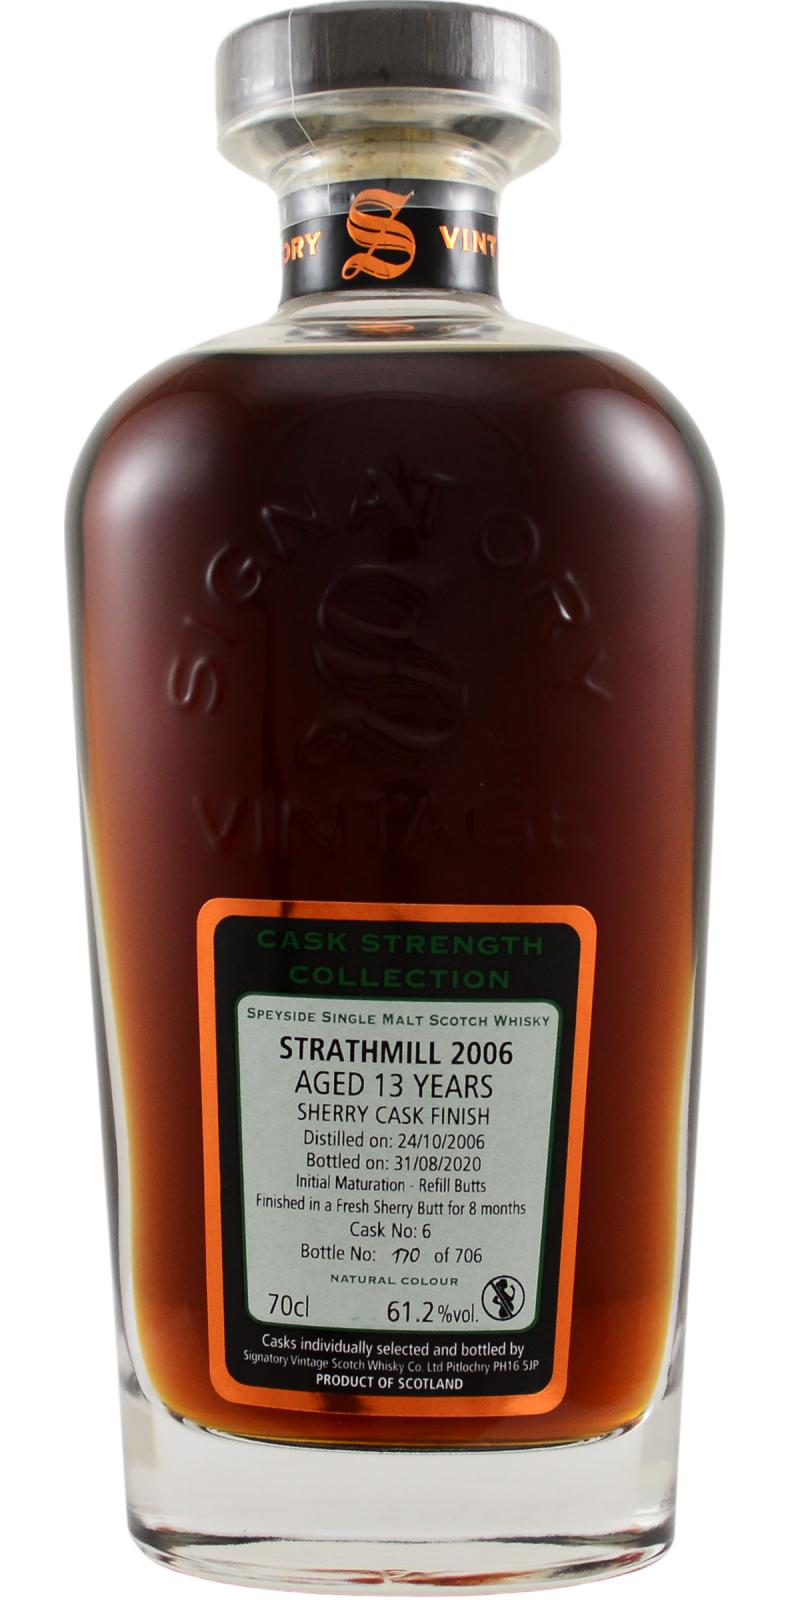 Strathmill 2006 SV